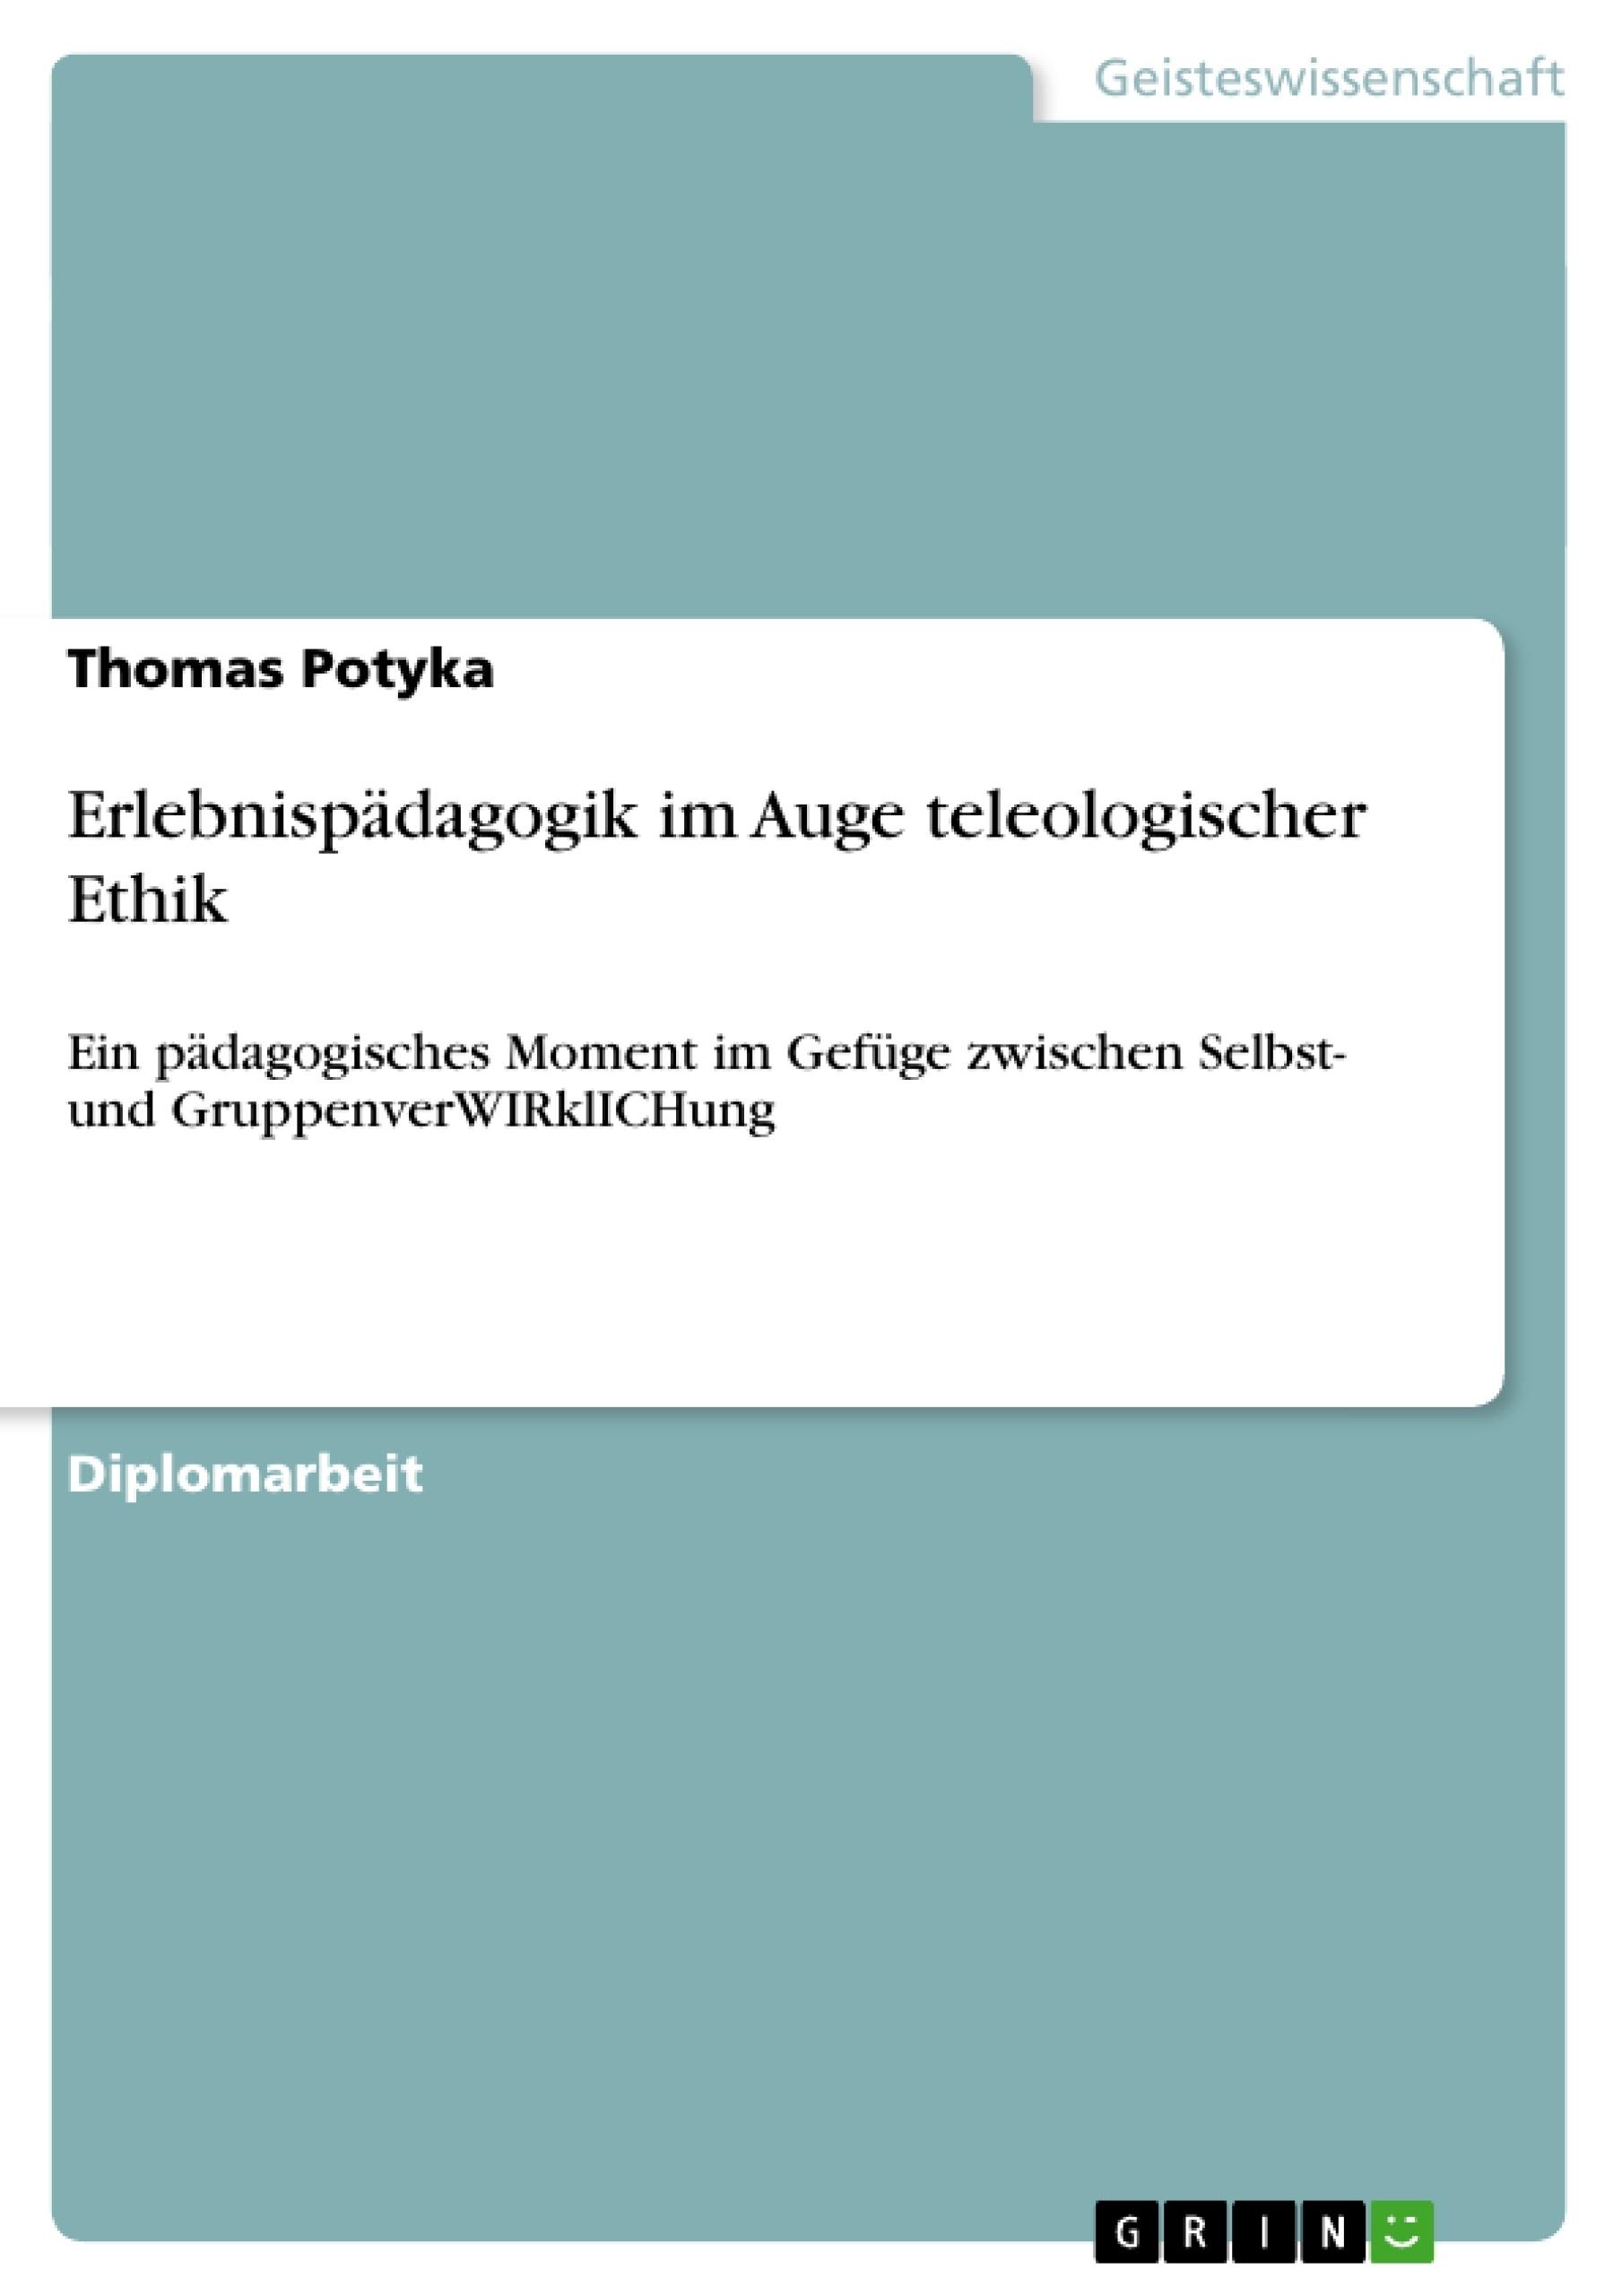 Titel: Erlebnispädagogik im Auge teleologischer Ethik